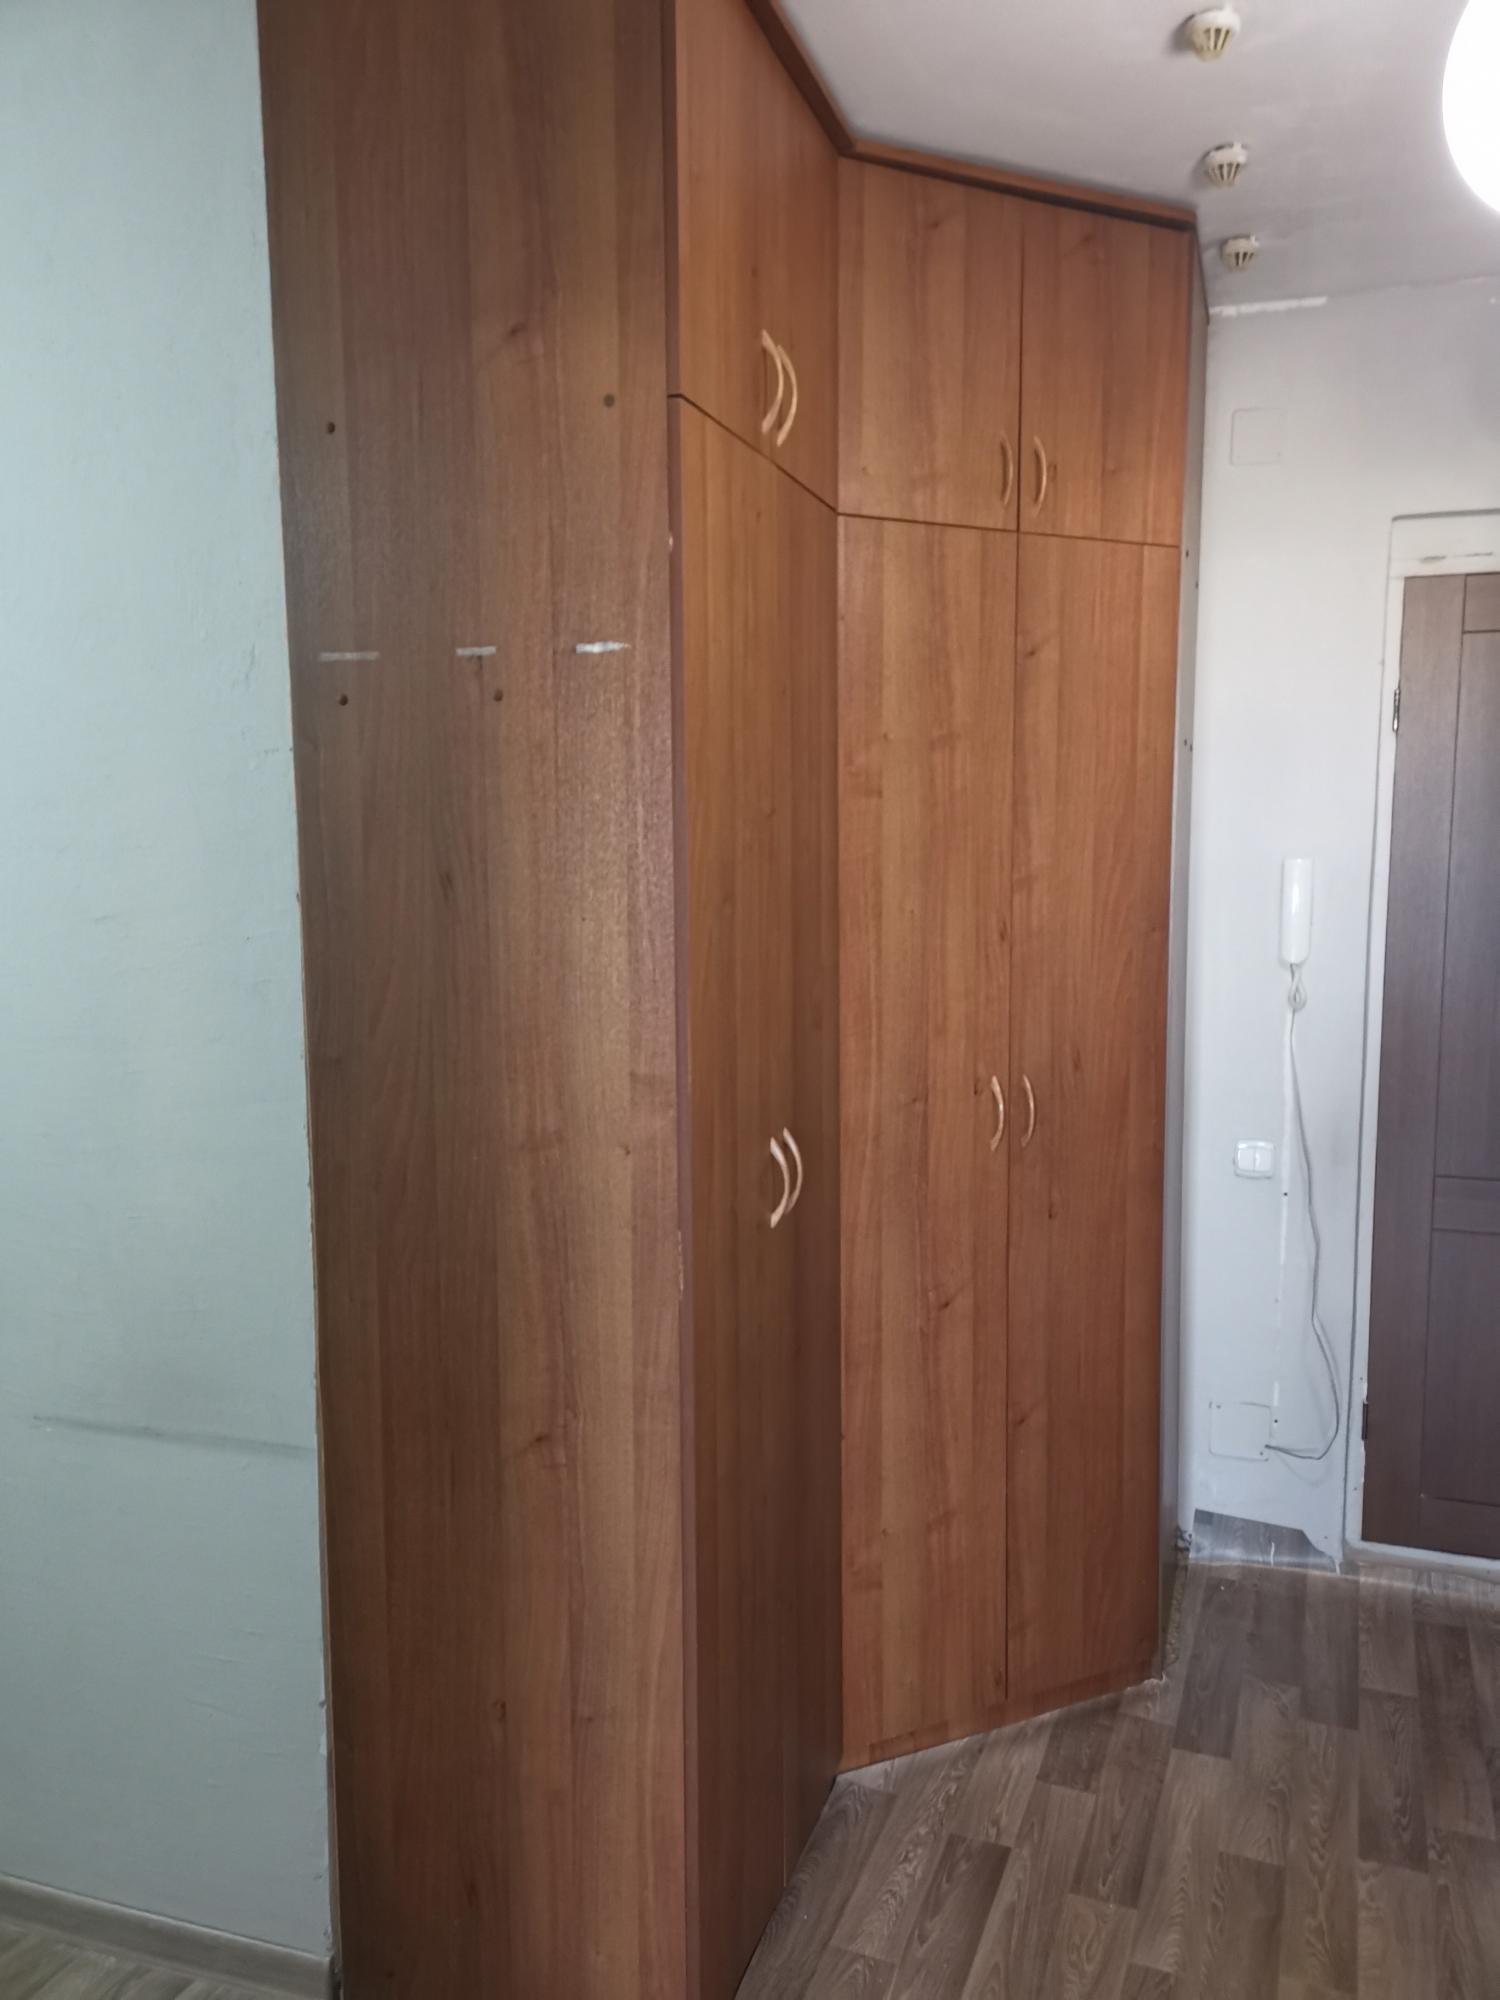 1к квартира улица Куйбышева, 97 | 15000 | аренда в Красноярске фото 8